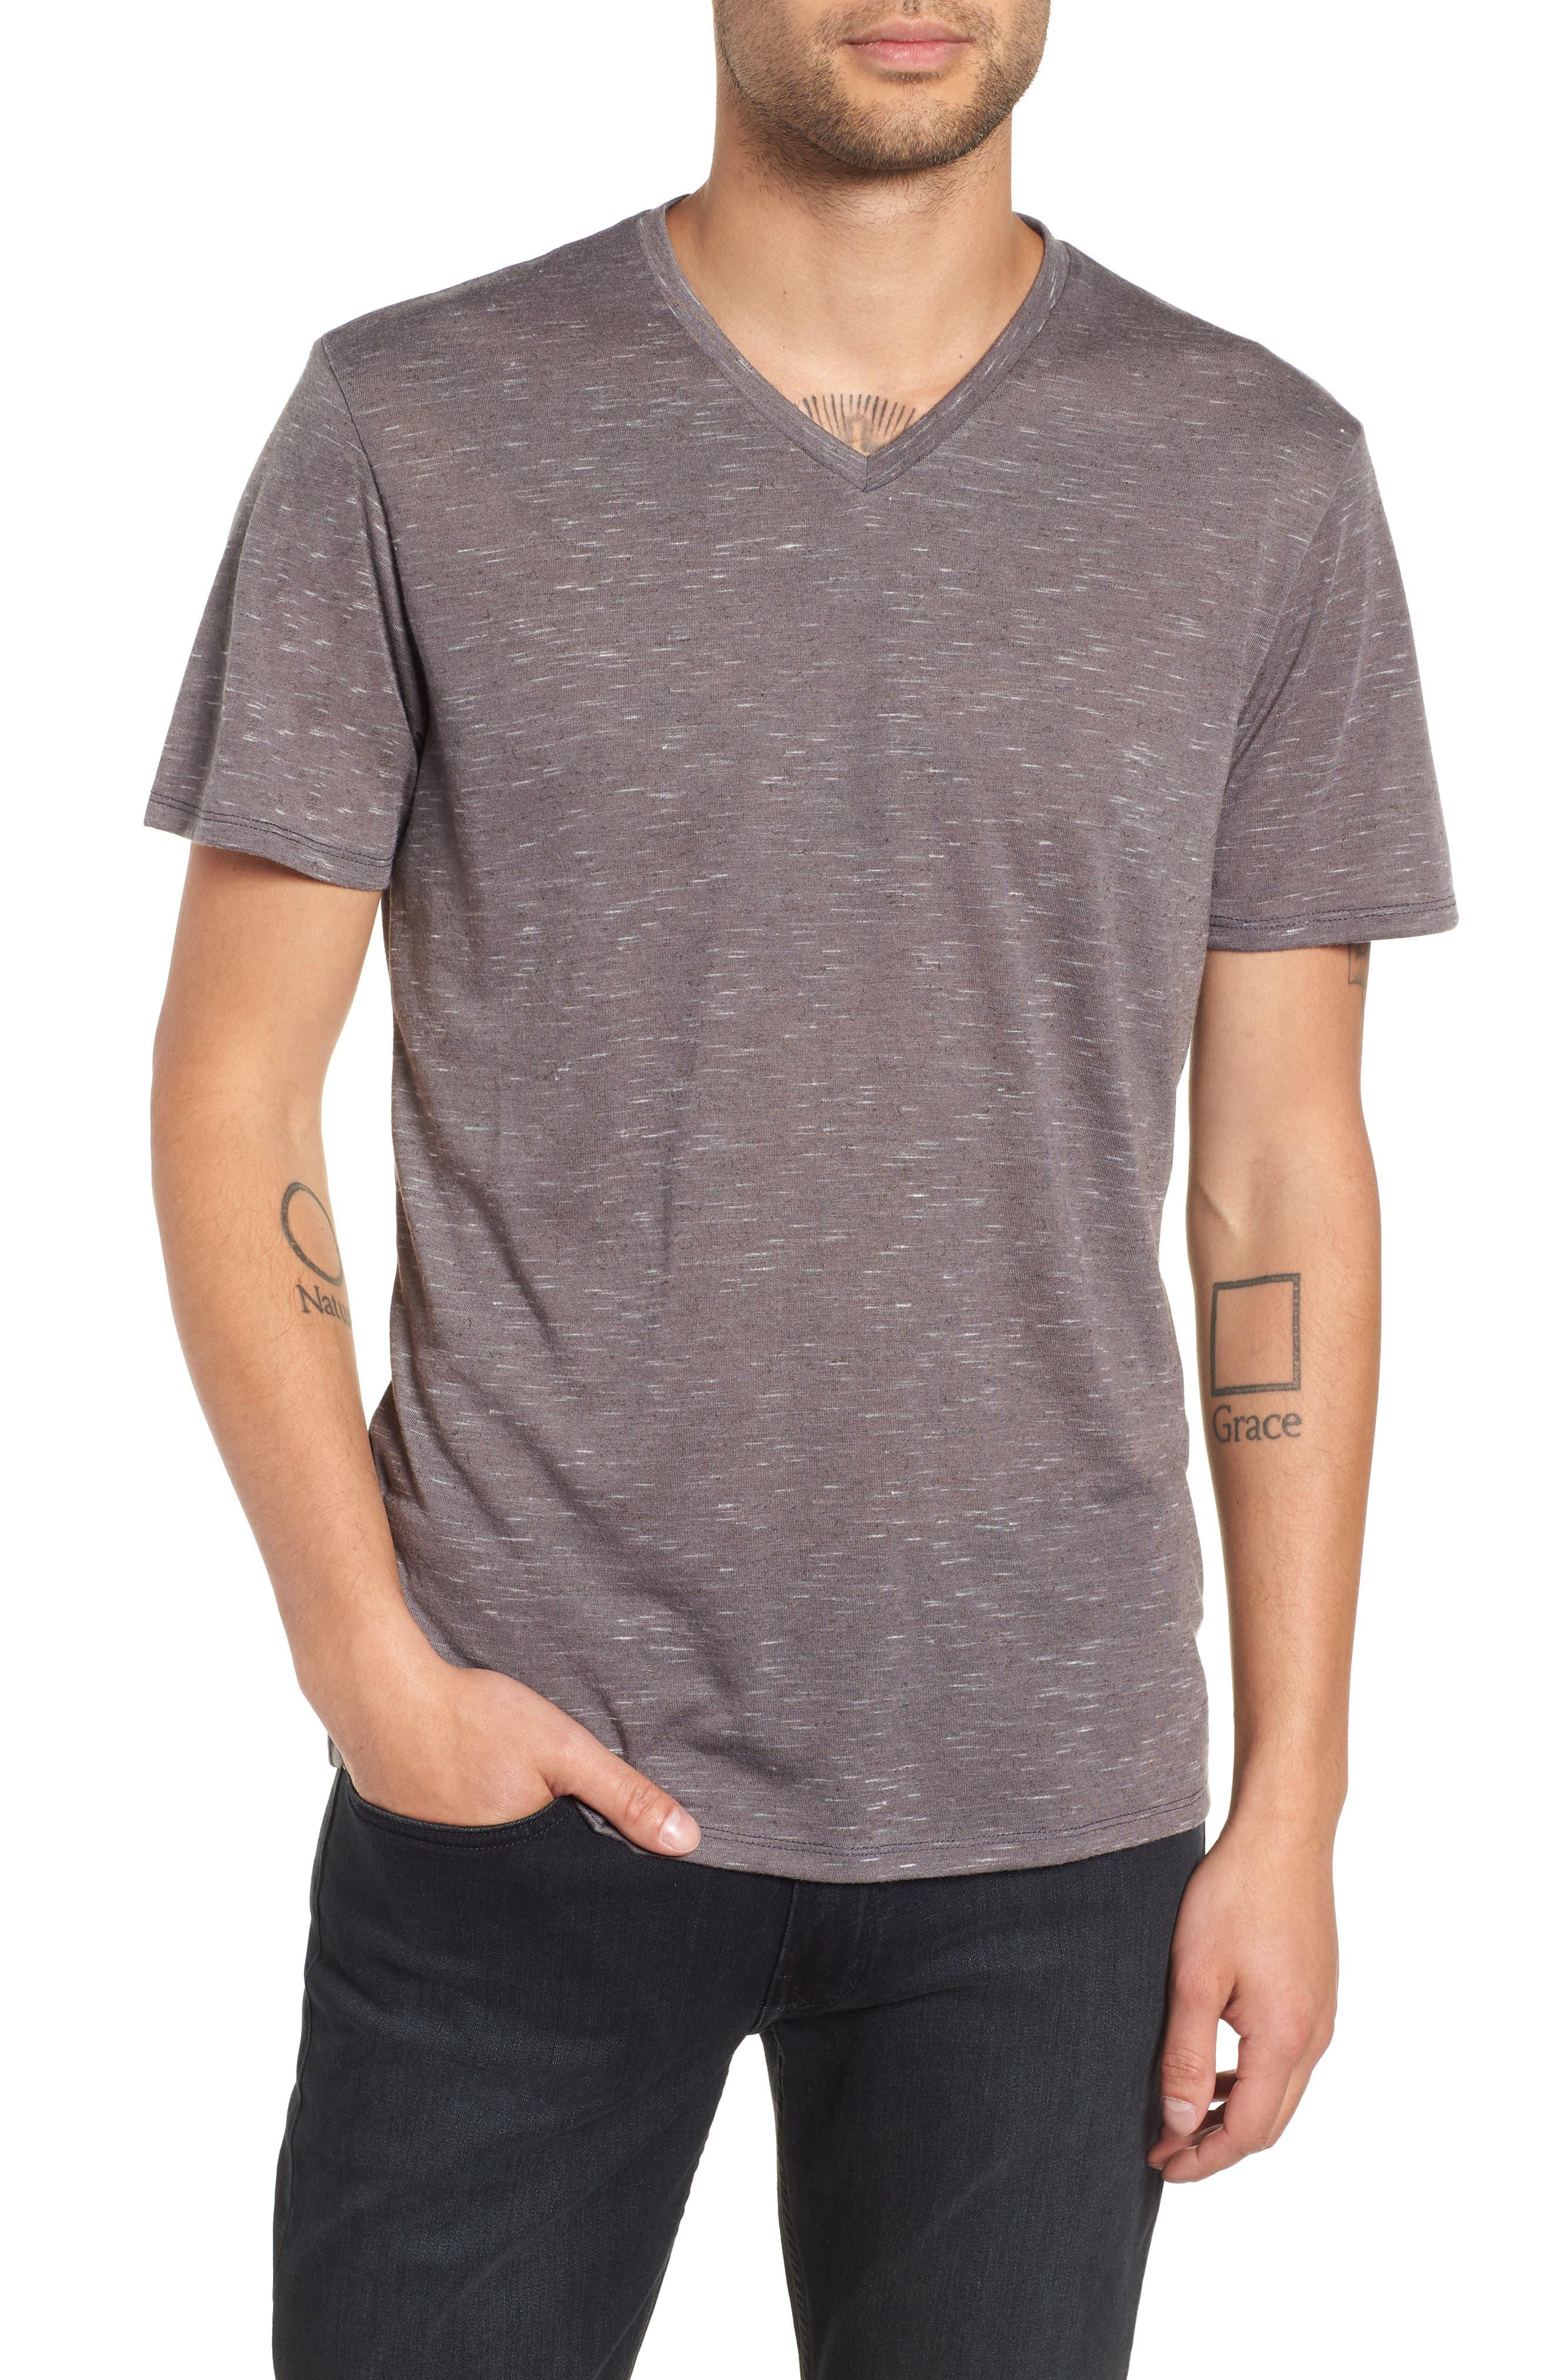 THE RAIL, Streaky V-Neck T-Shirt, Main thumbnail 1, color, GREY TORNADO- WHITE